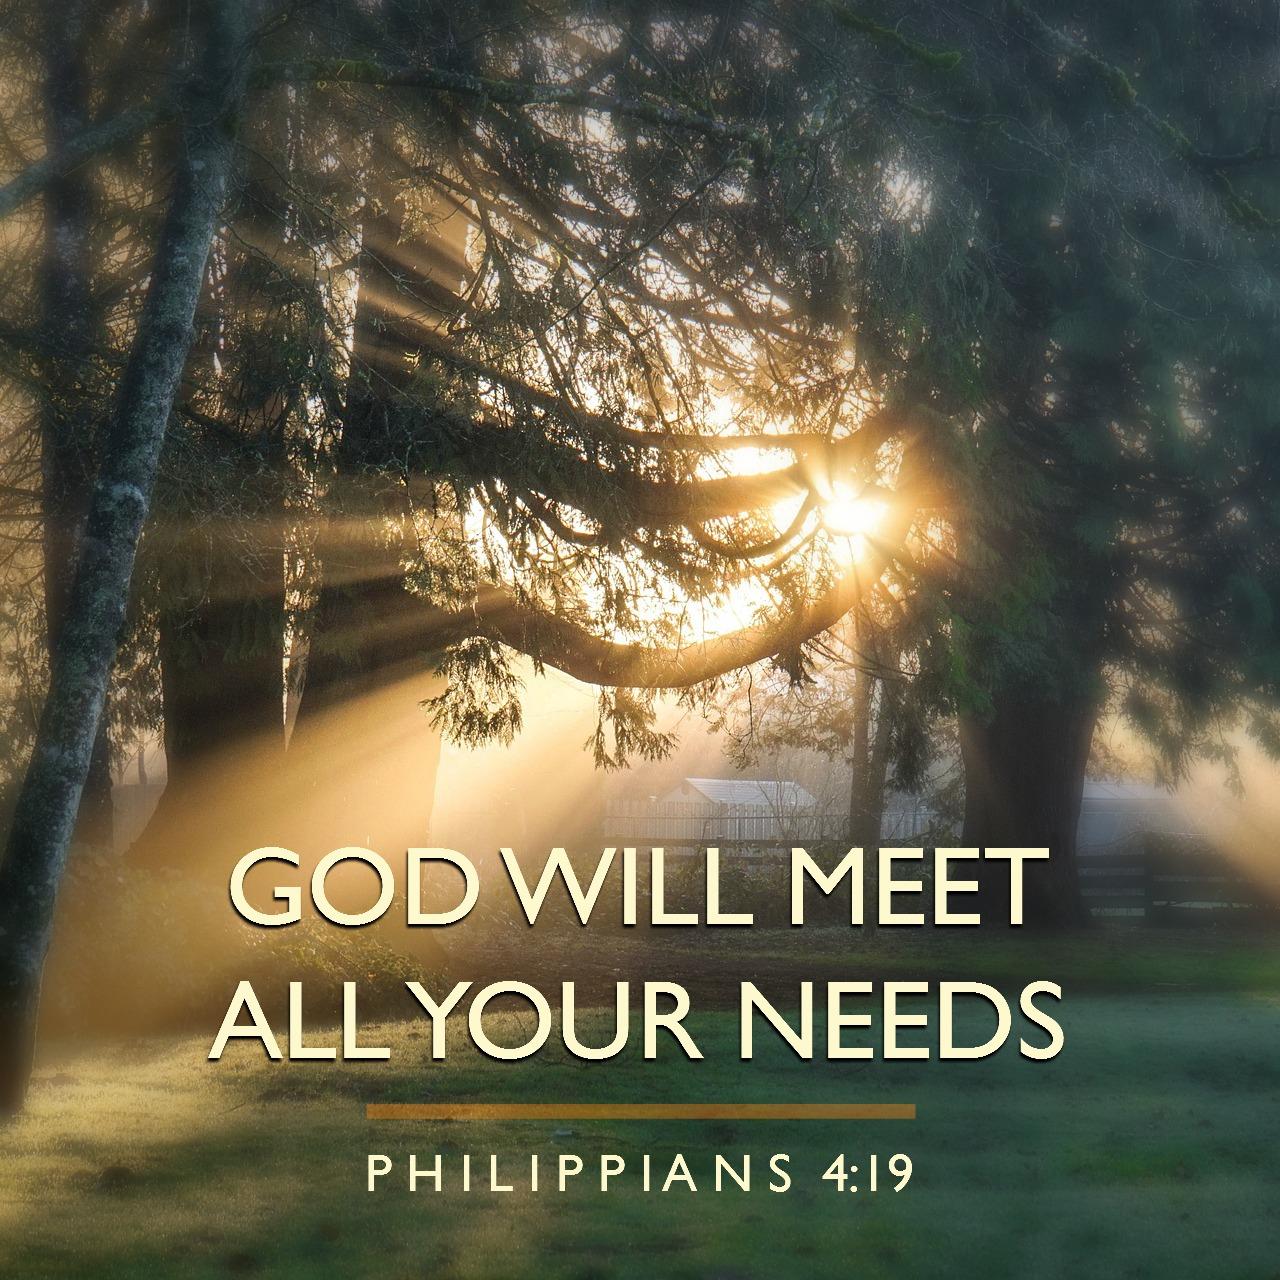 May 2 - Philippians 4:19